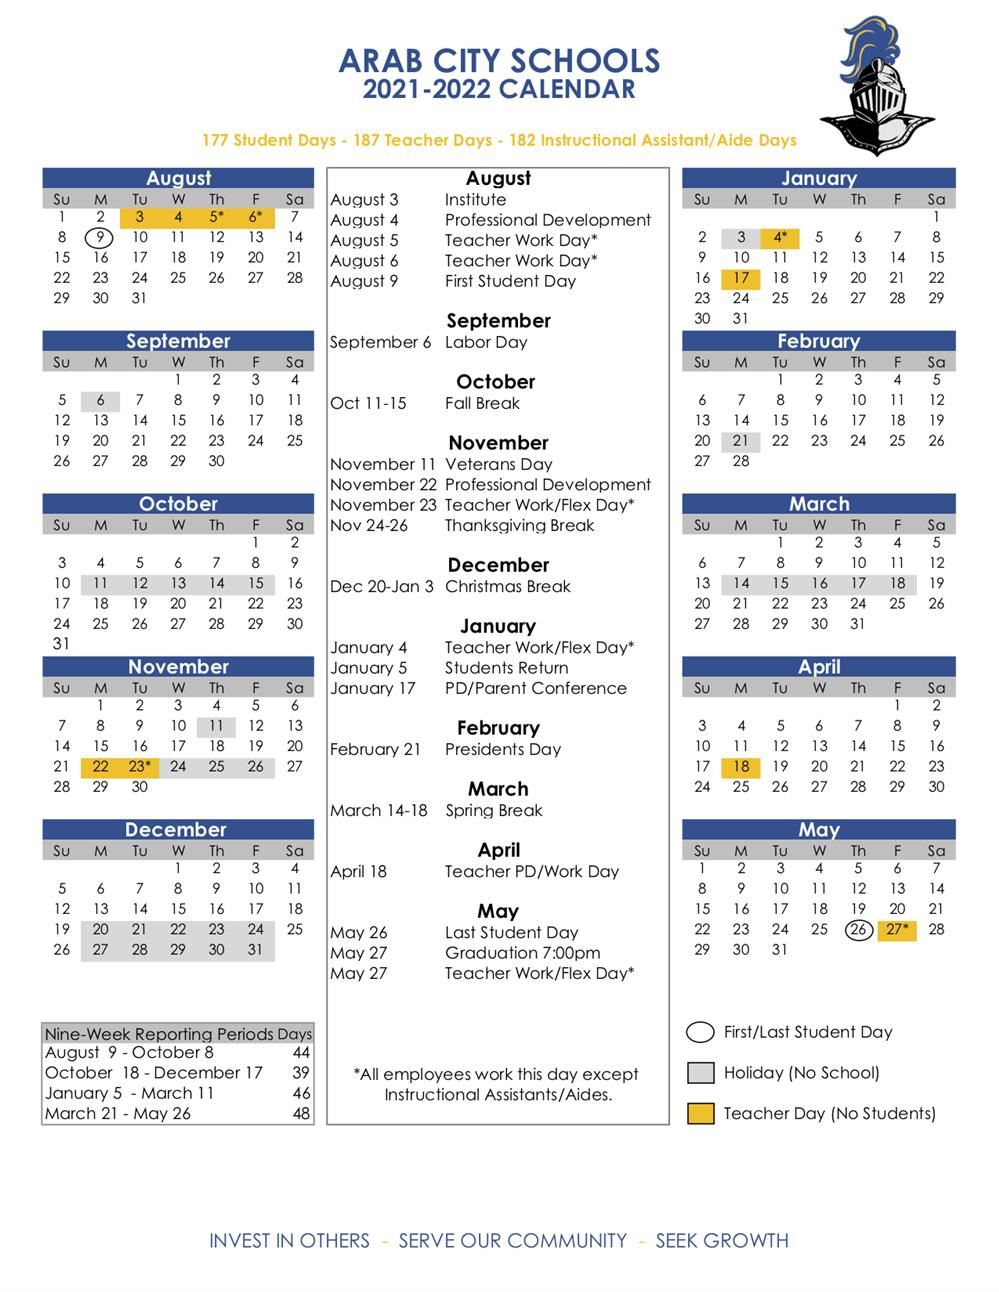 School Calendar 2021-22 Academic Calendars / 2021 22 ACS Calendar